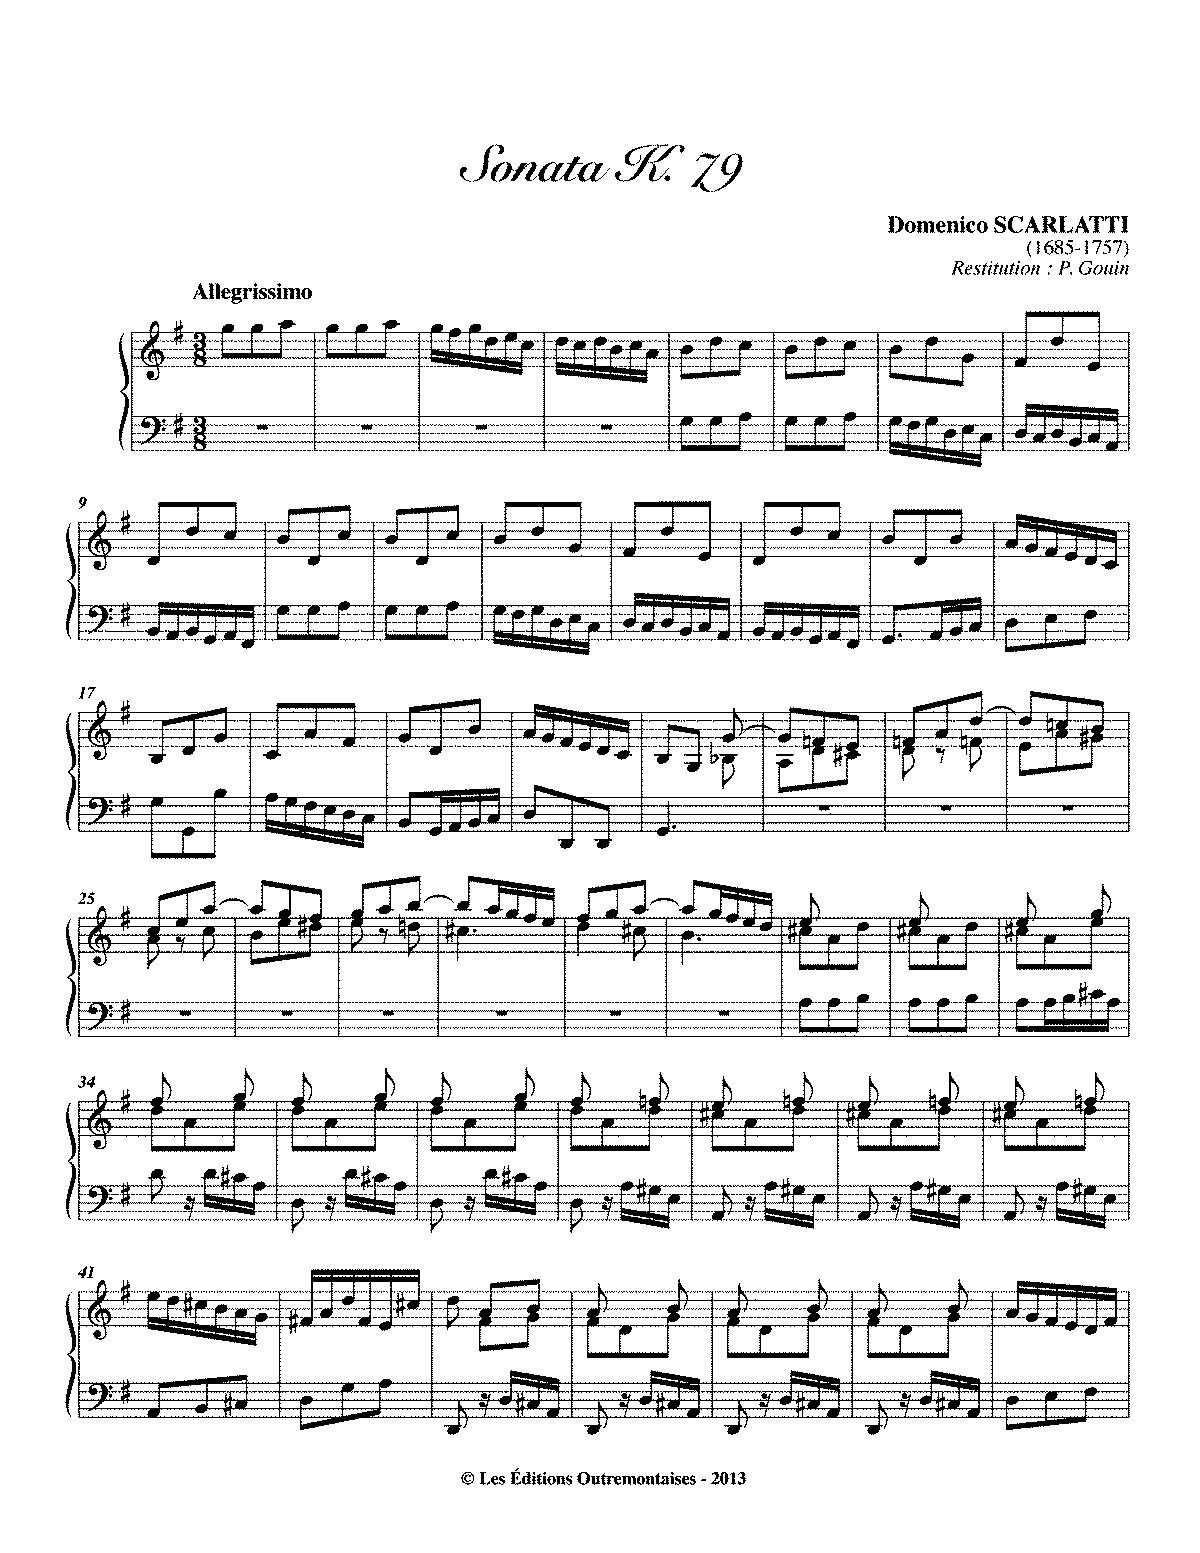 Keyboard sonata in g major k79 scarlatti domenico imslp arrangements and transcriptions hexwebz Gallery